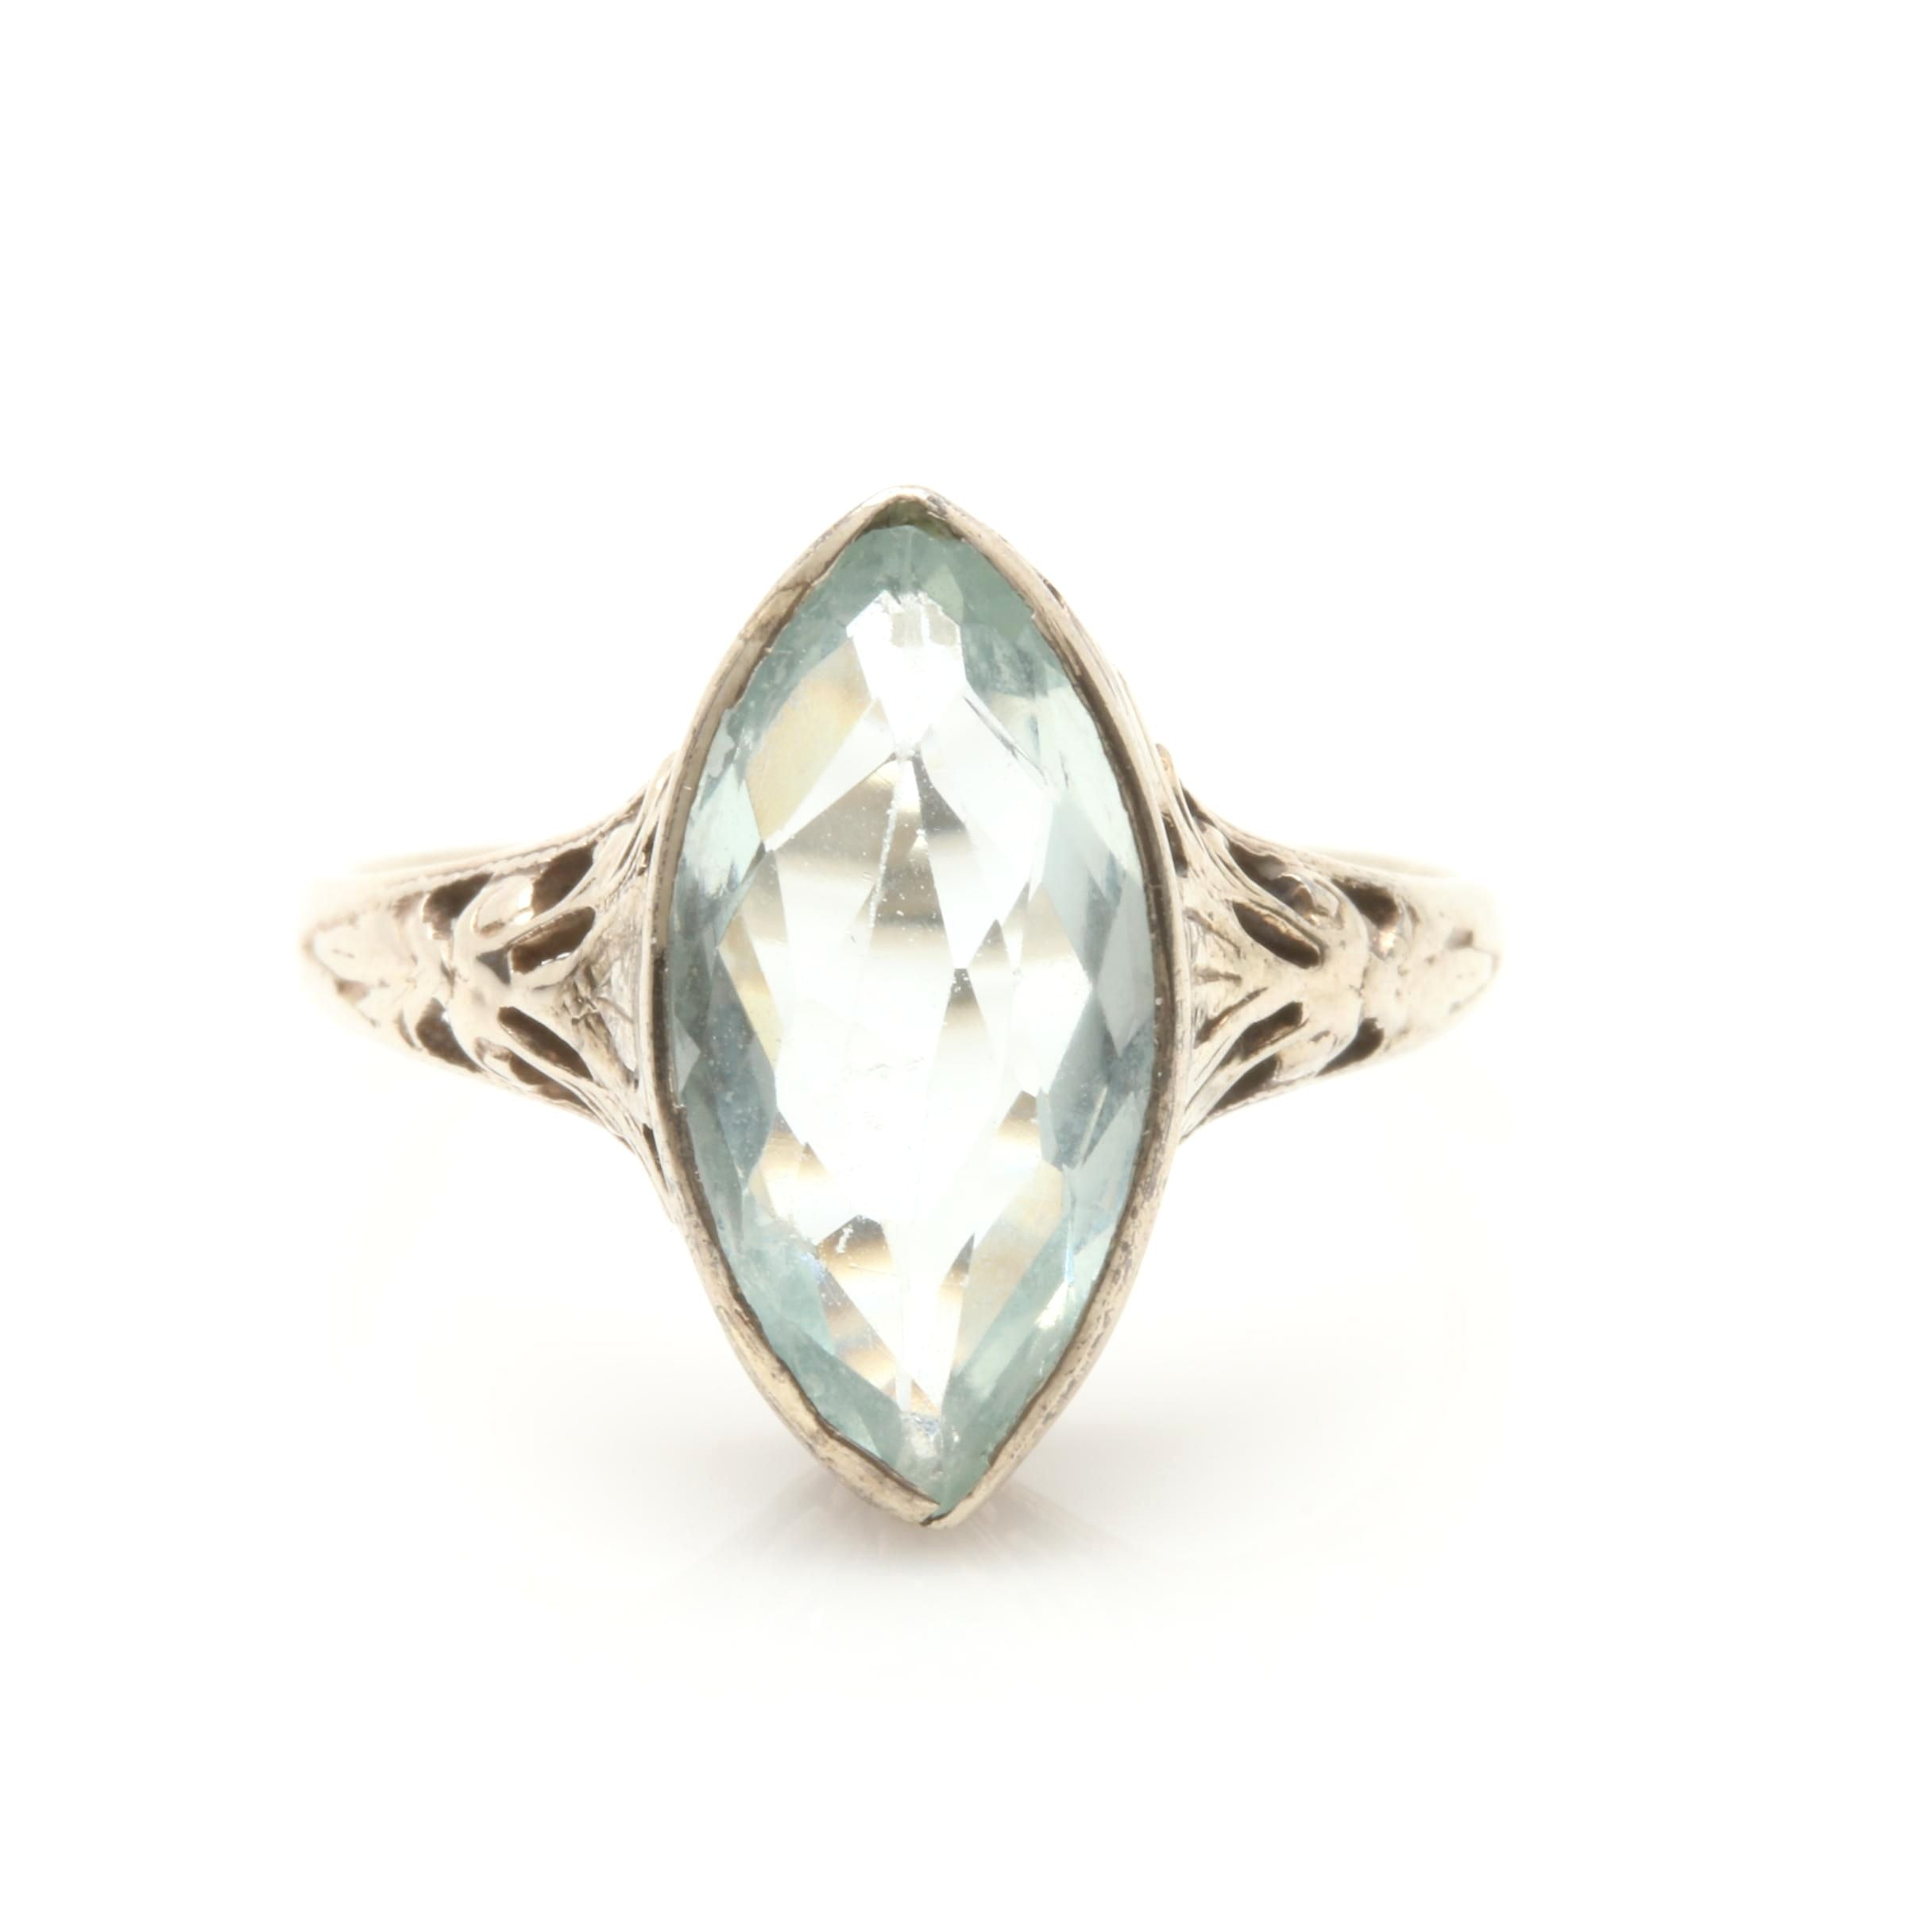 Art Deco 14K White Gold Aquamarine Ring